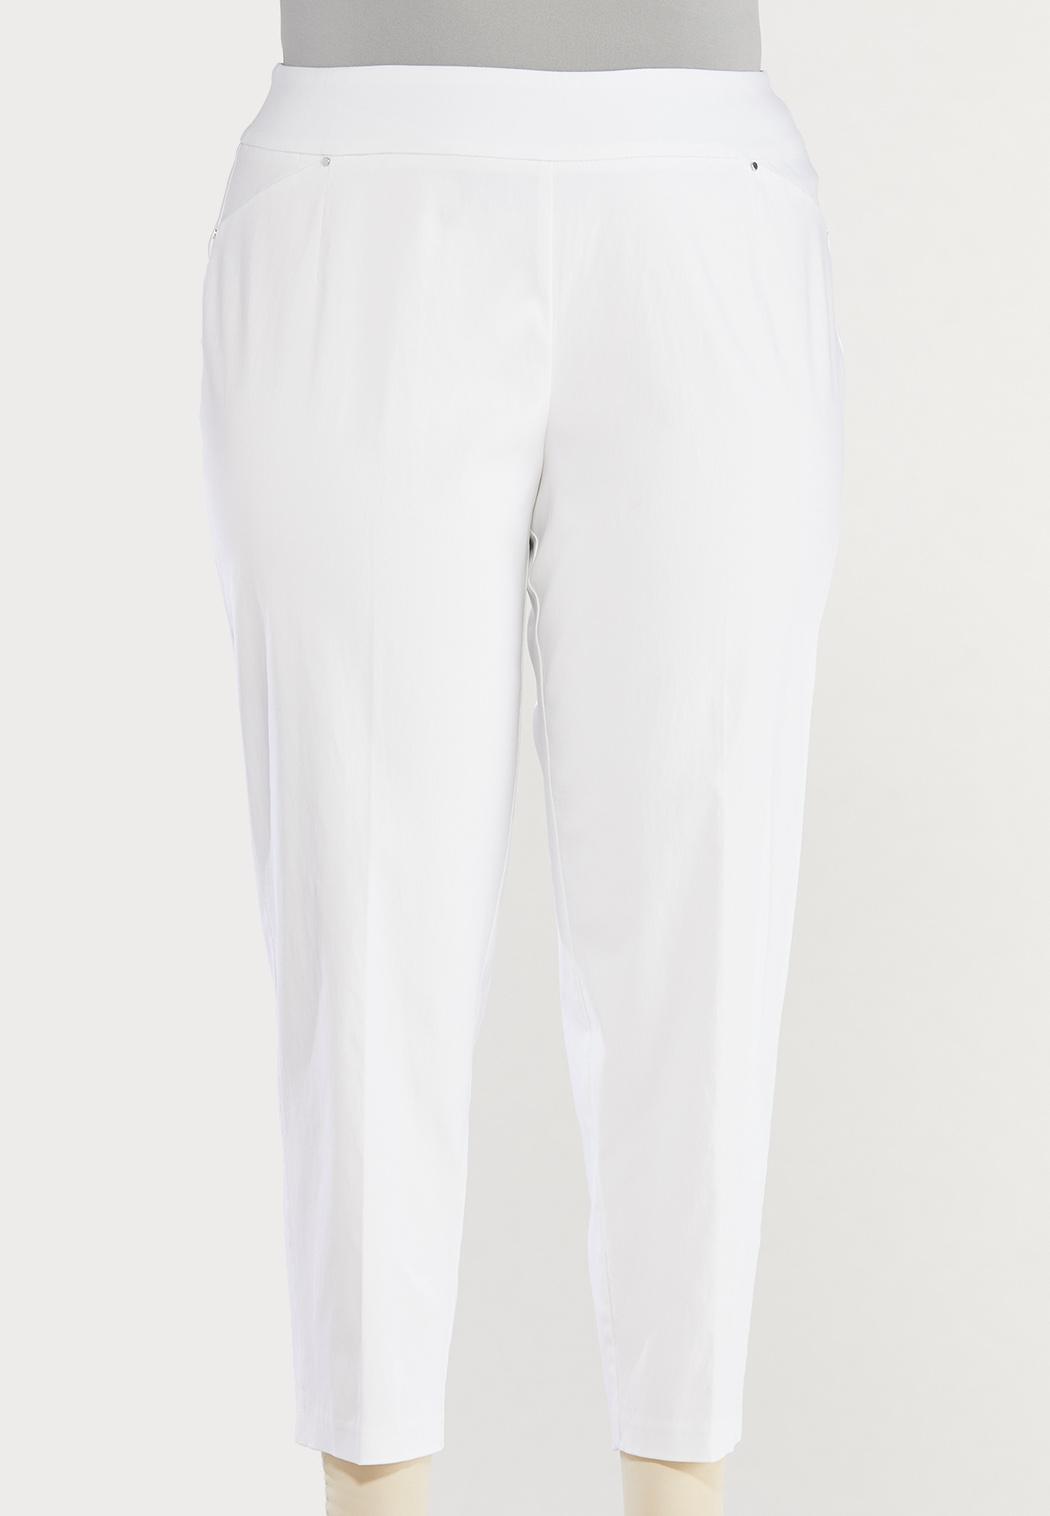 Plus Petite Solid Bengaline Pants